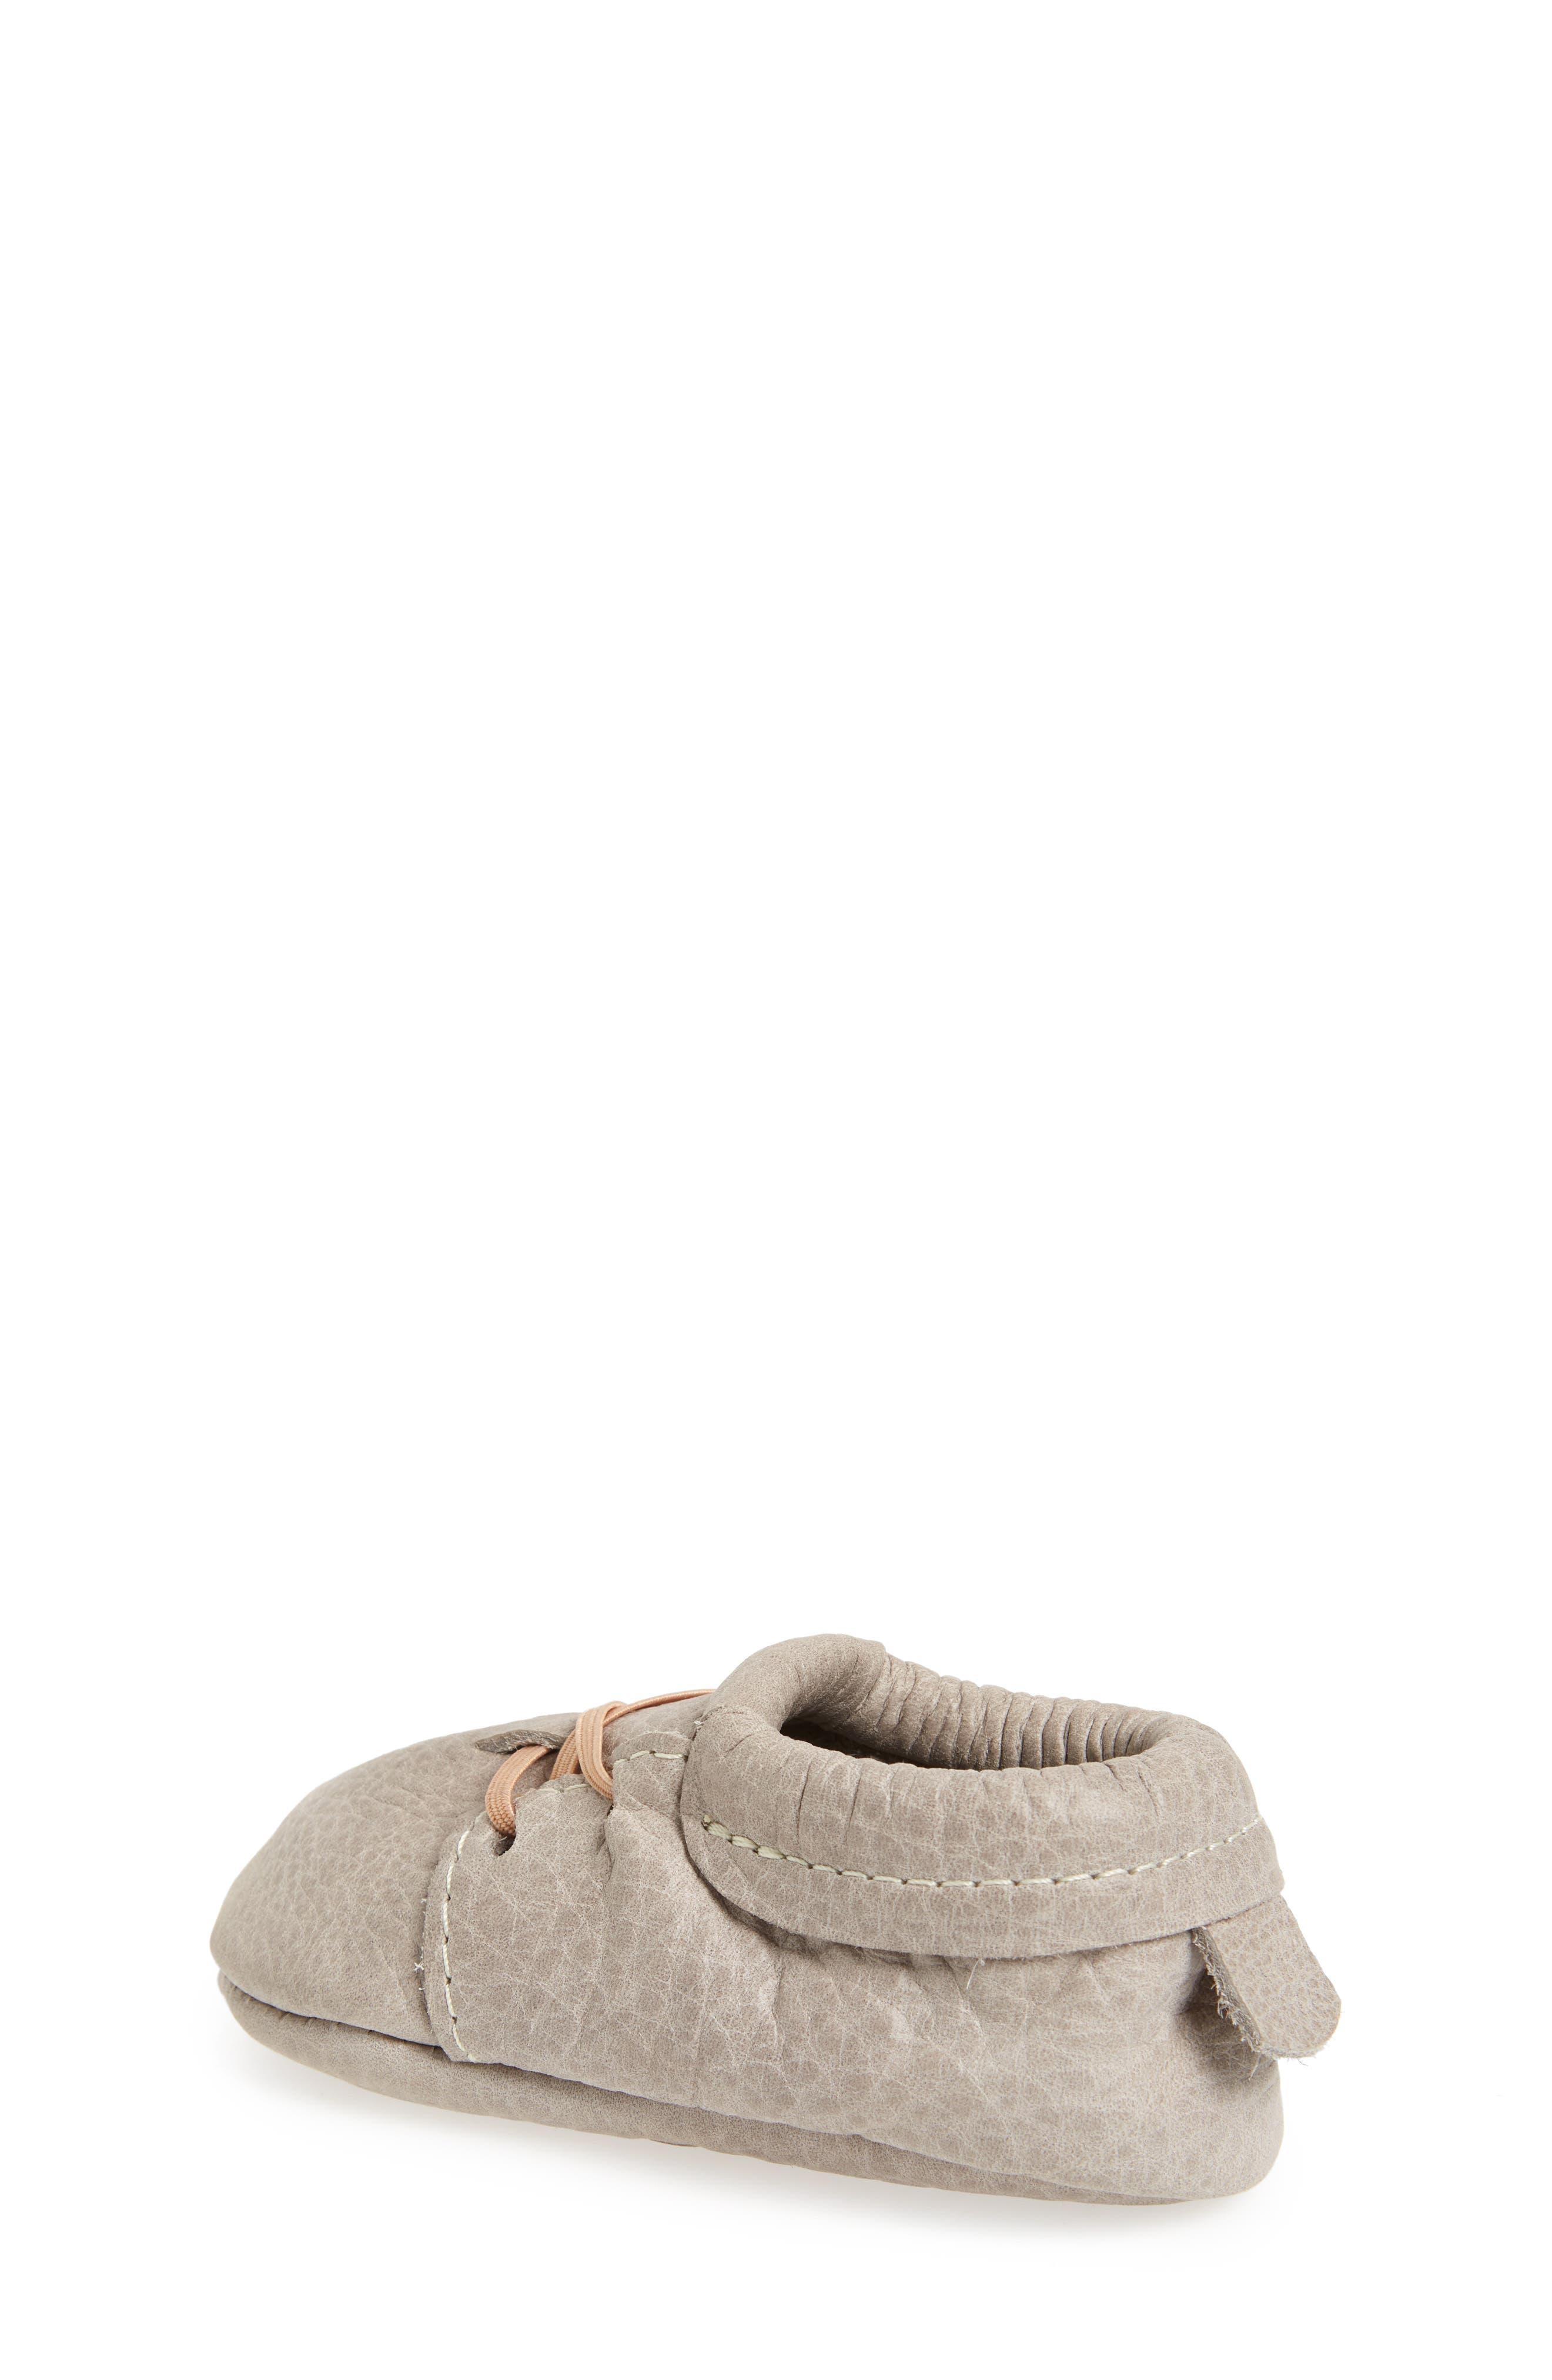 Oxford Crib Shoe,                             Alternate thumbnail 2, color,                             GRAY